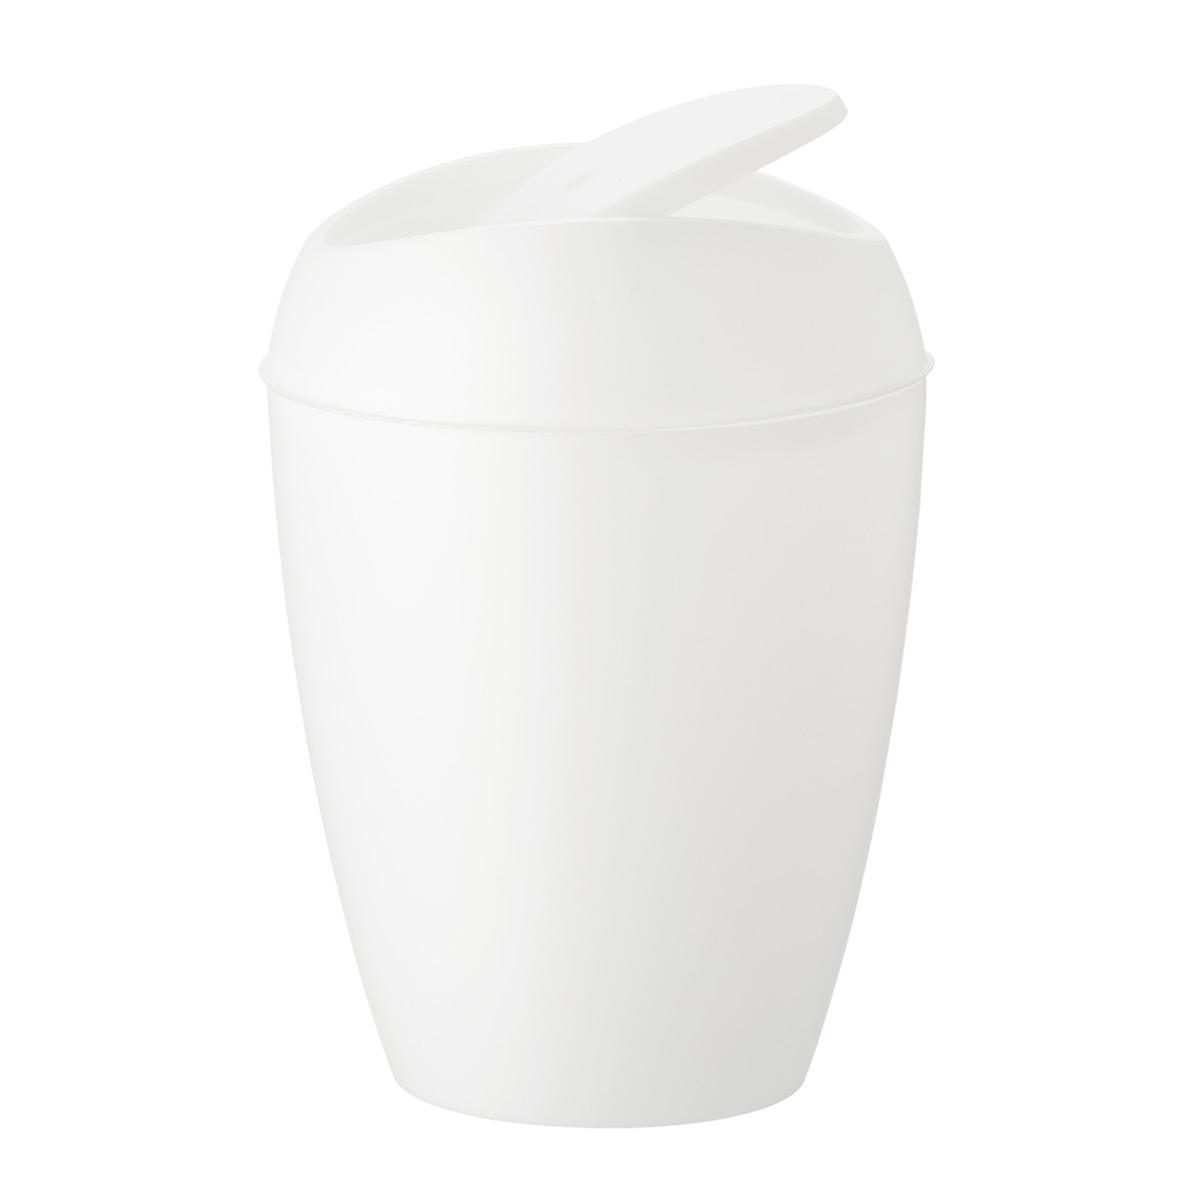 Umbra 2.4 gal/9L Metallic White Twirla Trash Can